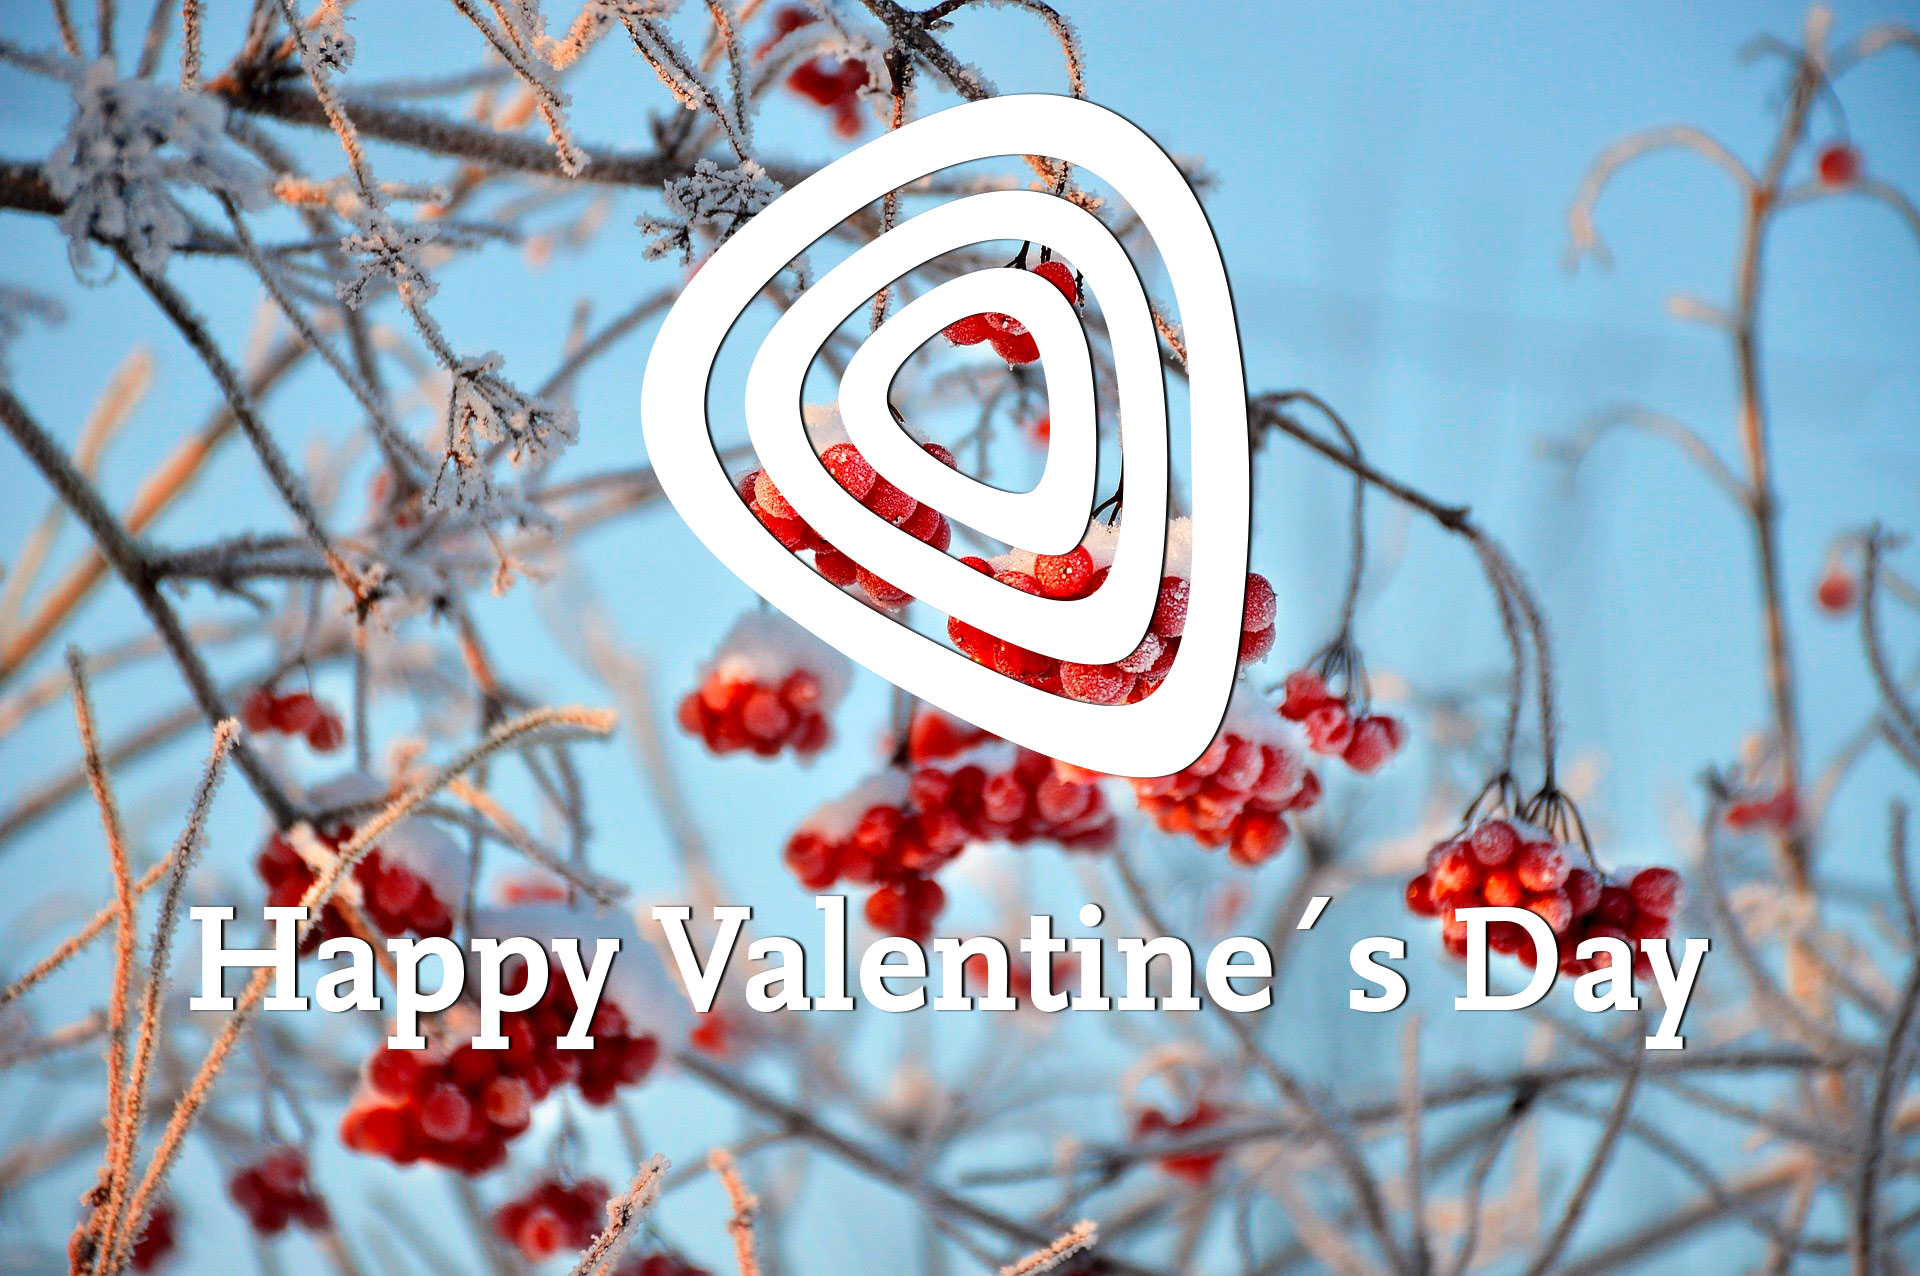 Valentinstag in besonderen Zeiten